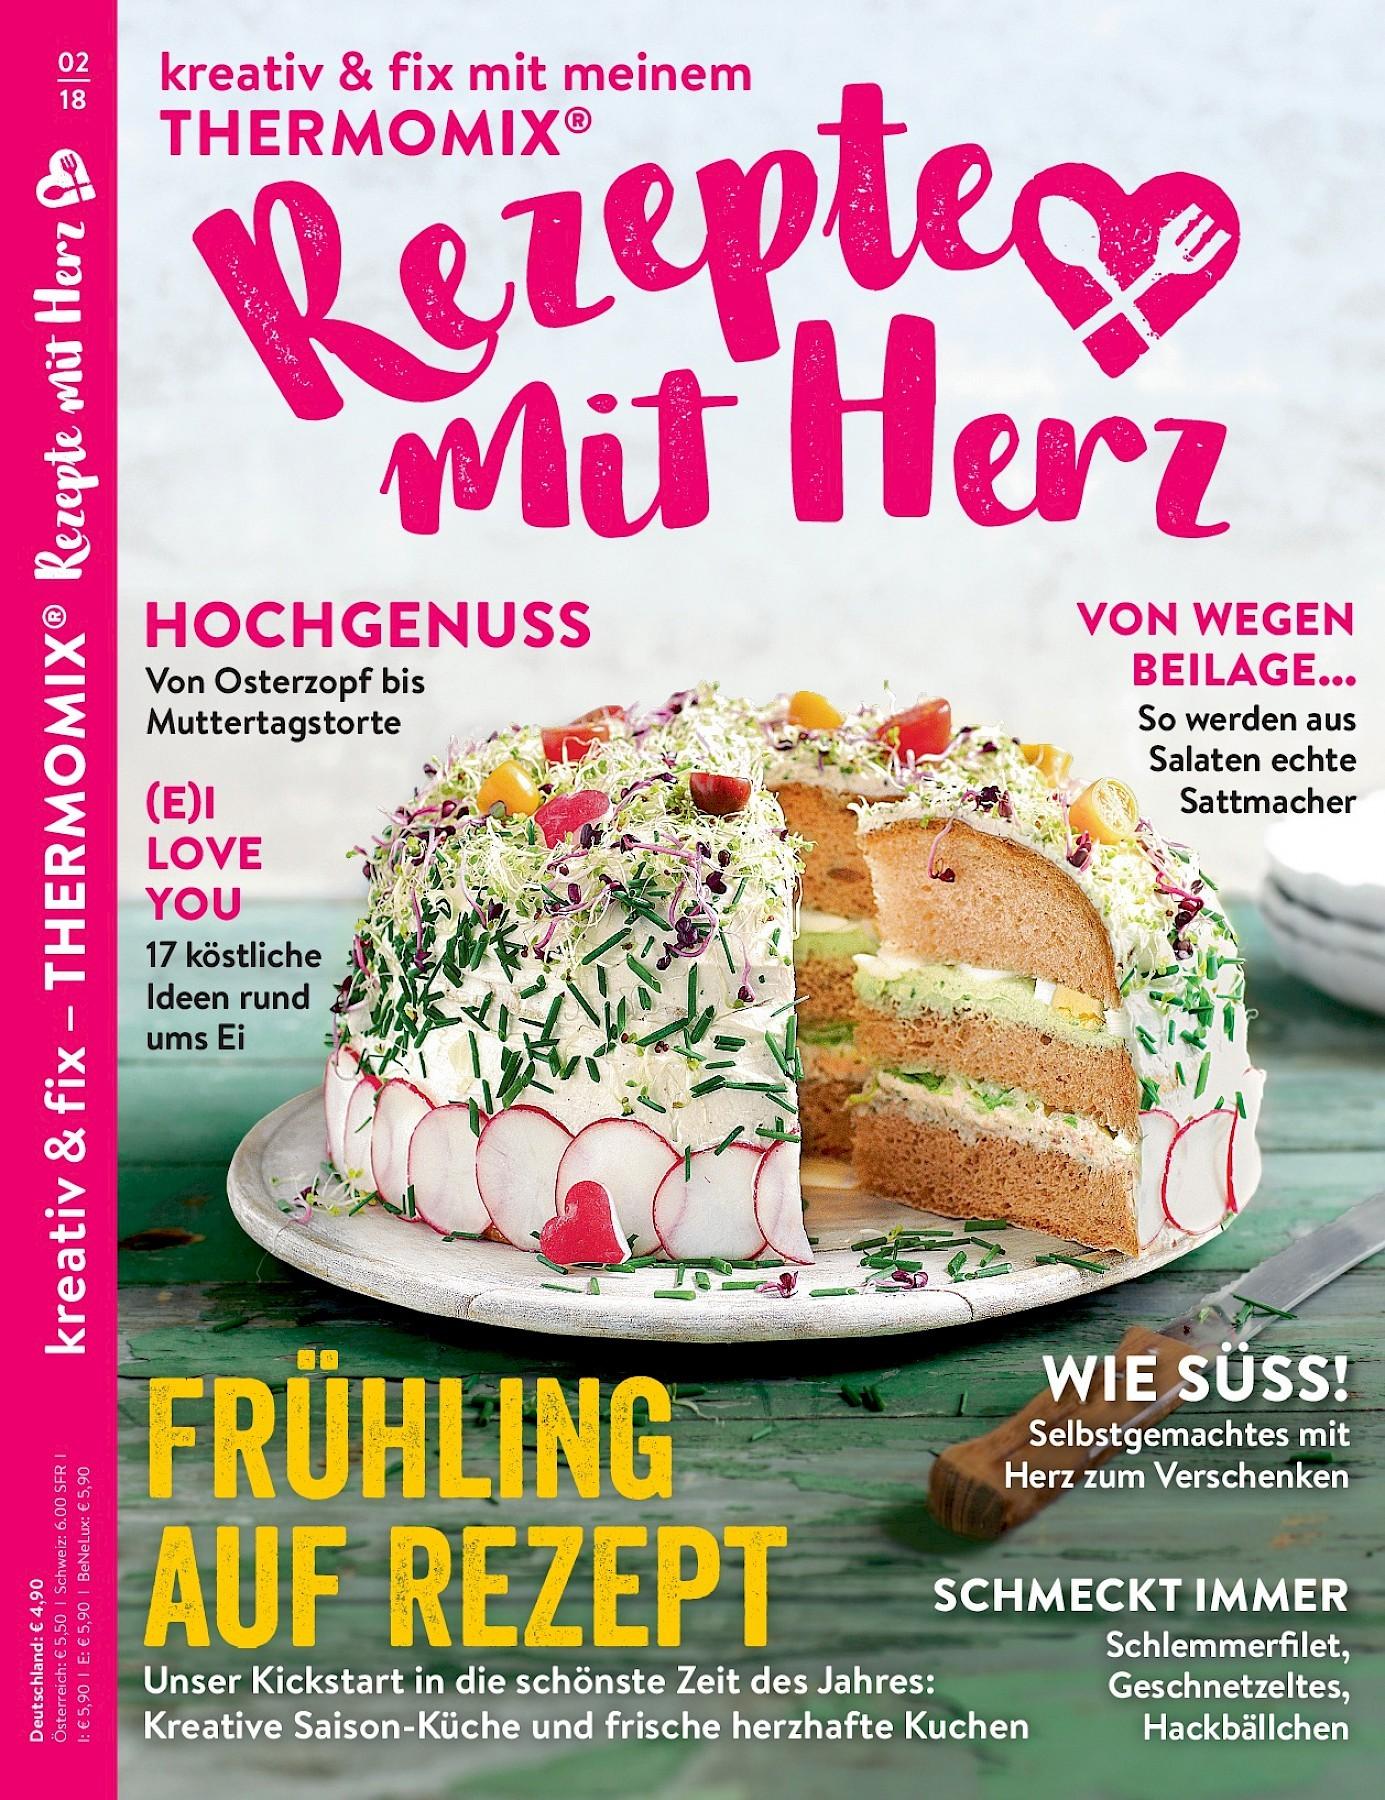 Rezepte Mit Herz 2 2018 Fruhlingsrezepte Aus Dem Thermomix